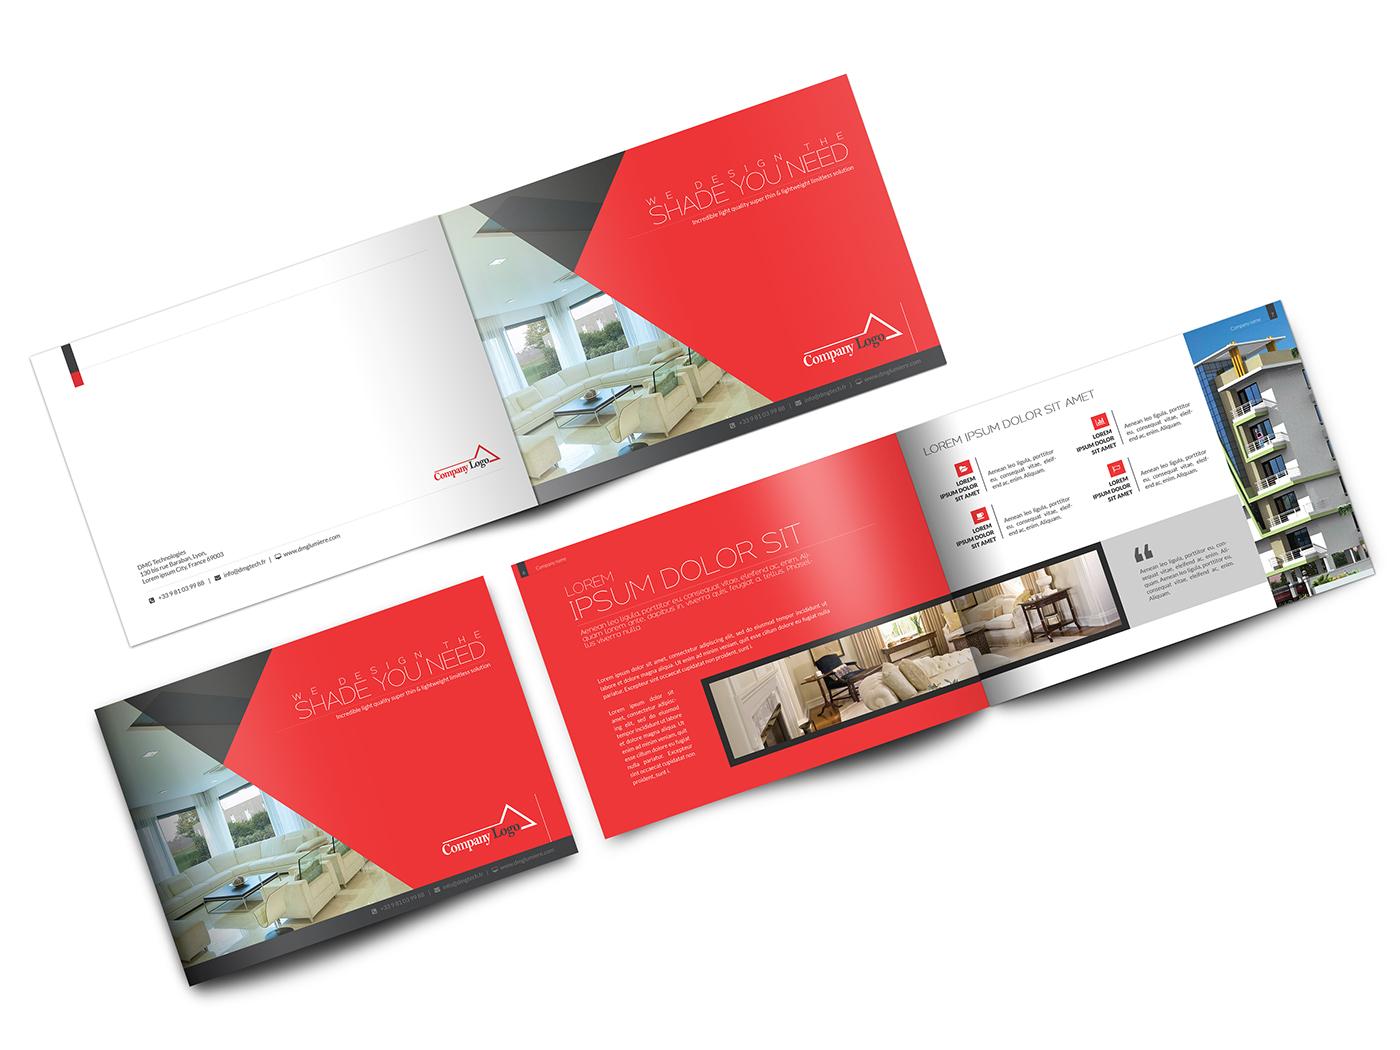 brochure landscape brochure Corporate Brochure Company Profil annual report real estate brochure real estate